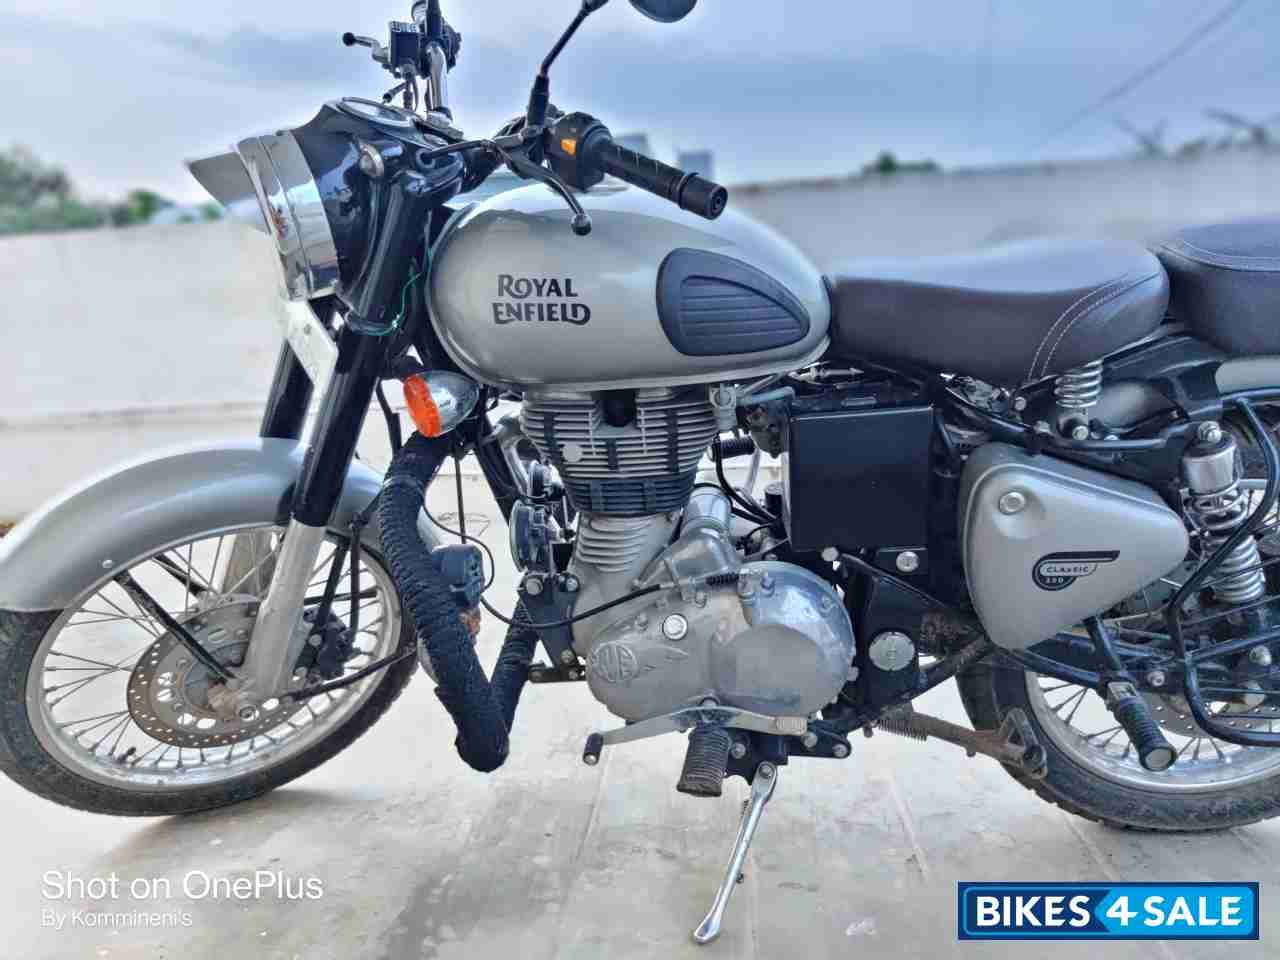 Used 2018 Model Royal Enfield Classic Gunmetal Grey For Sale In Vijayawada Id 286099 Bikes4sale